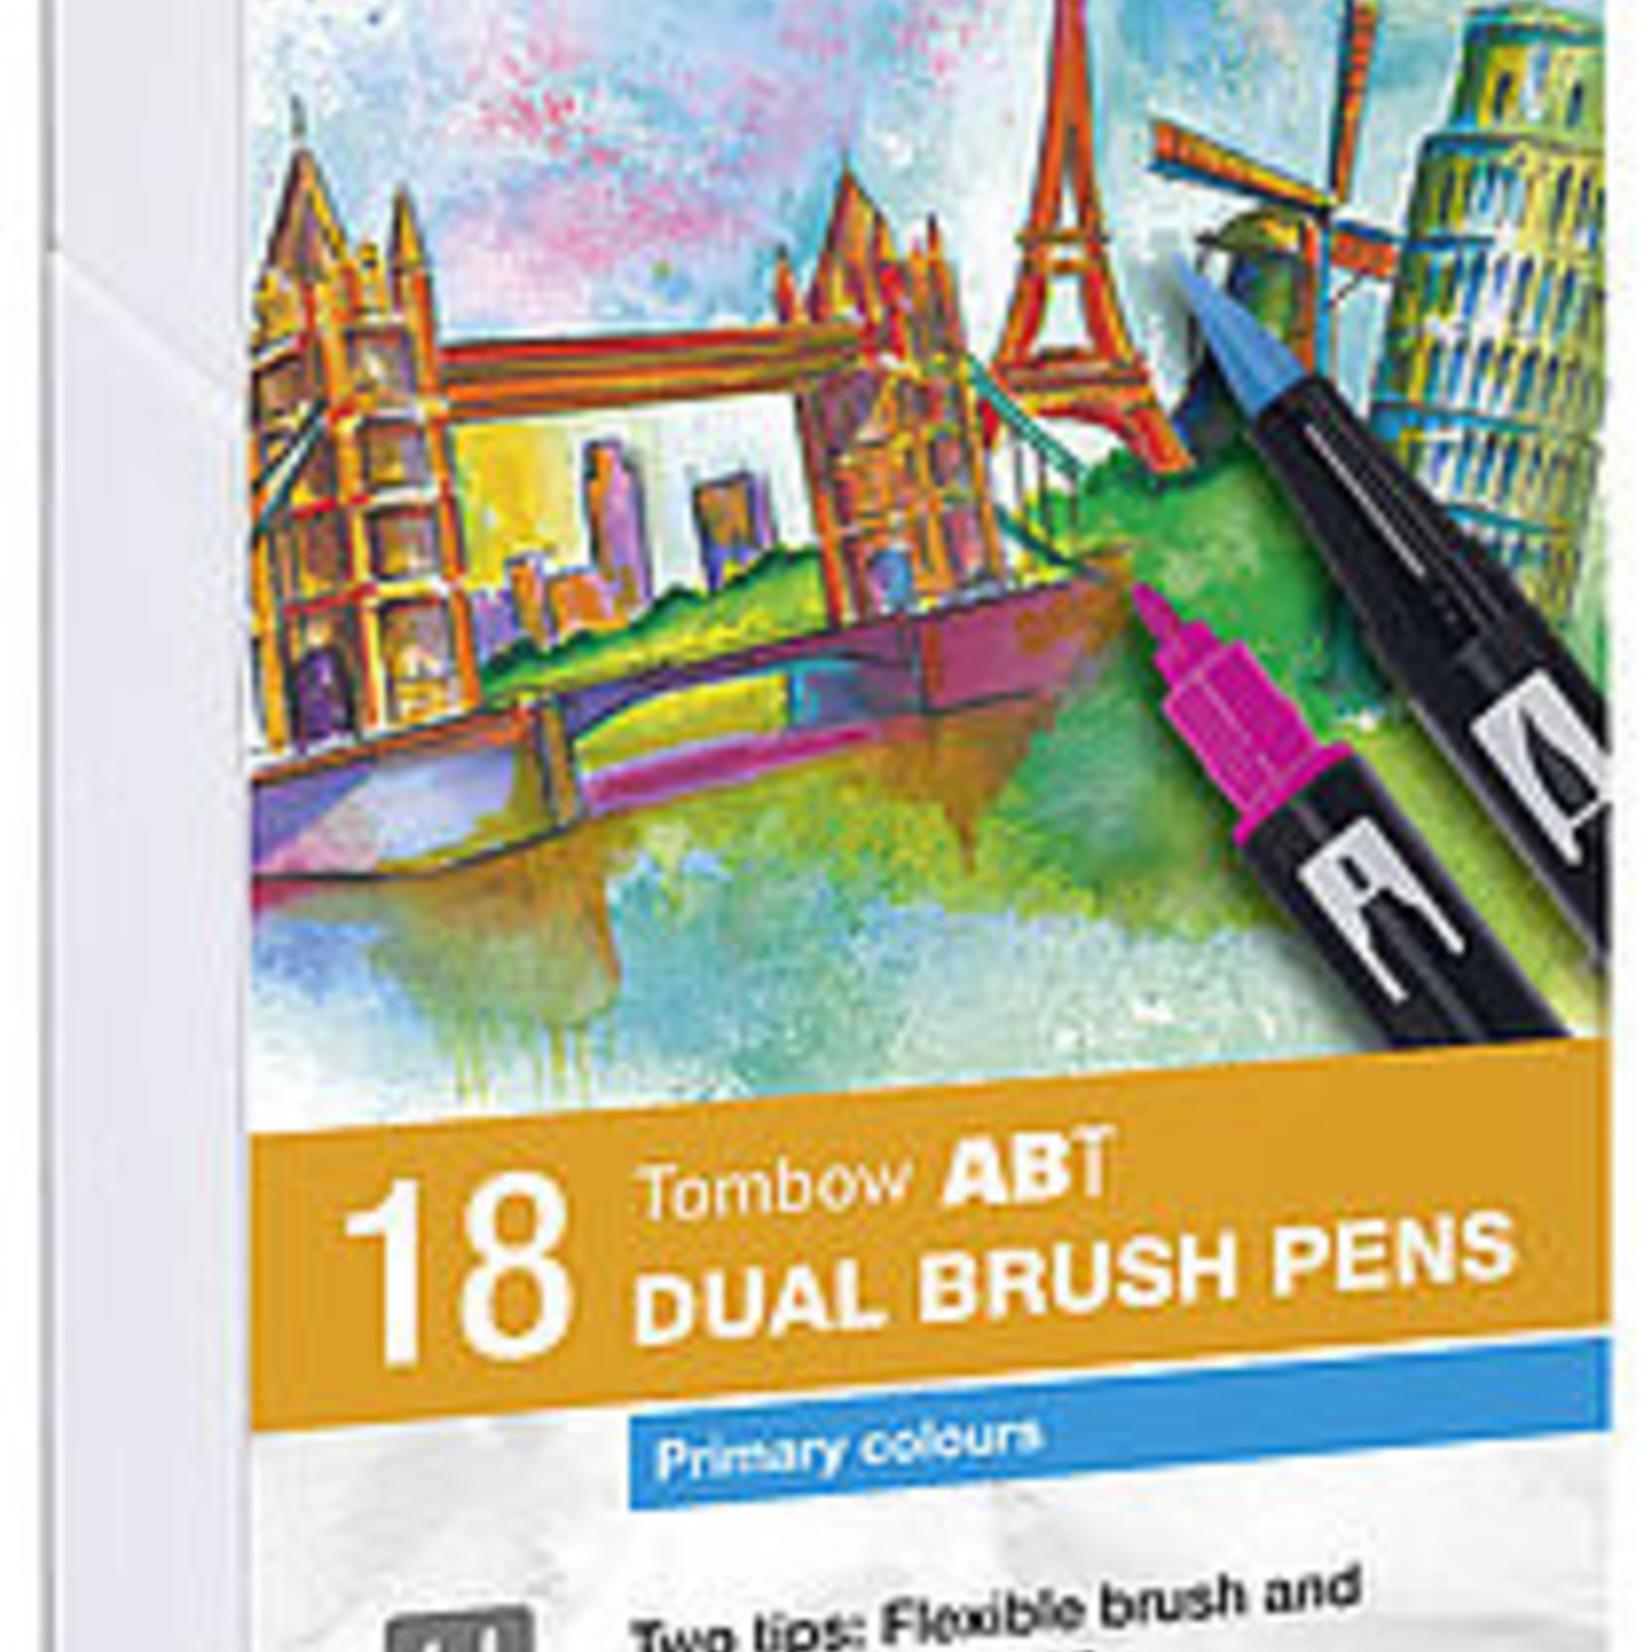 Tombow Dual Brush Pen 18er Set Primärfarben